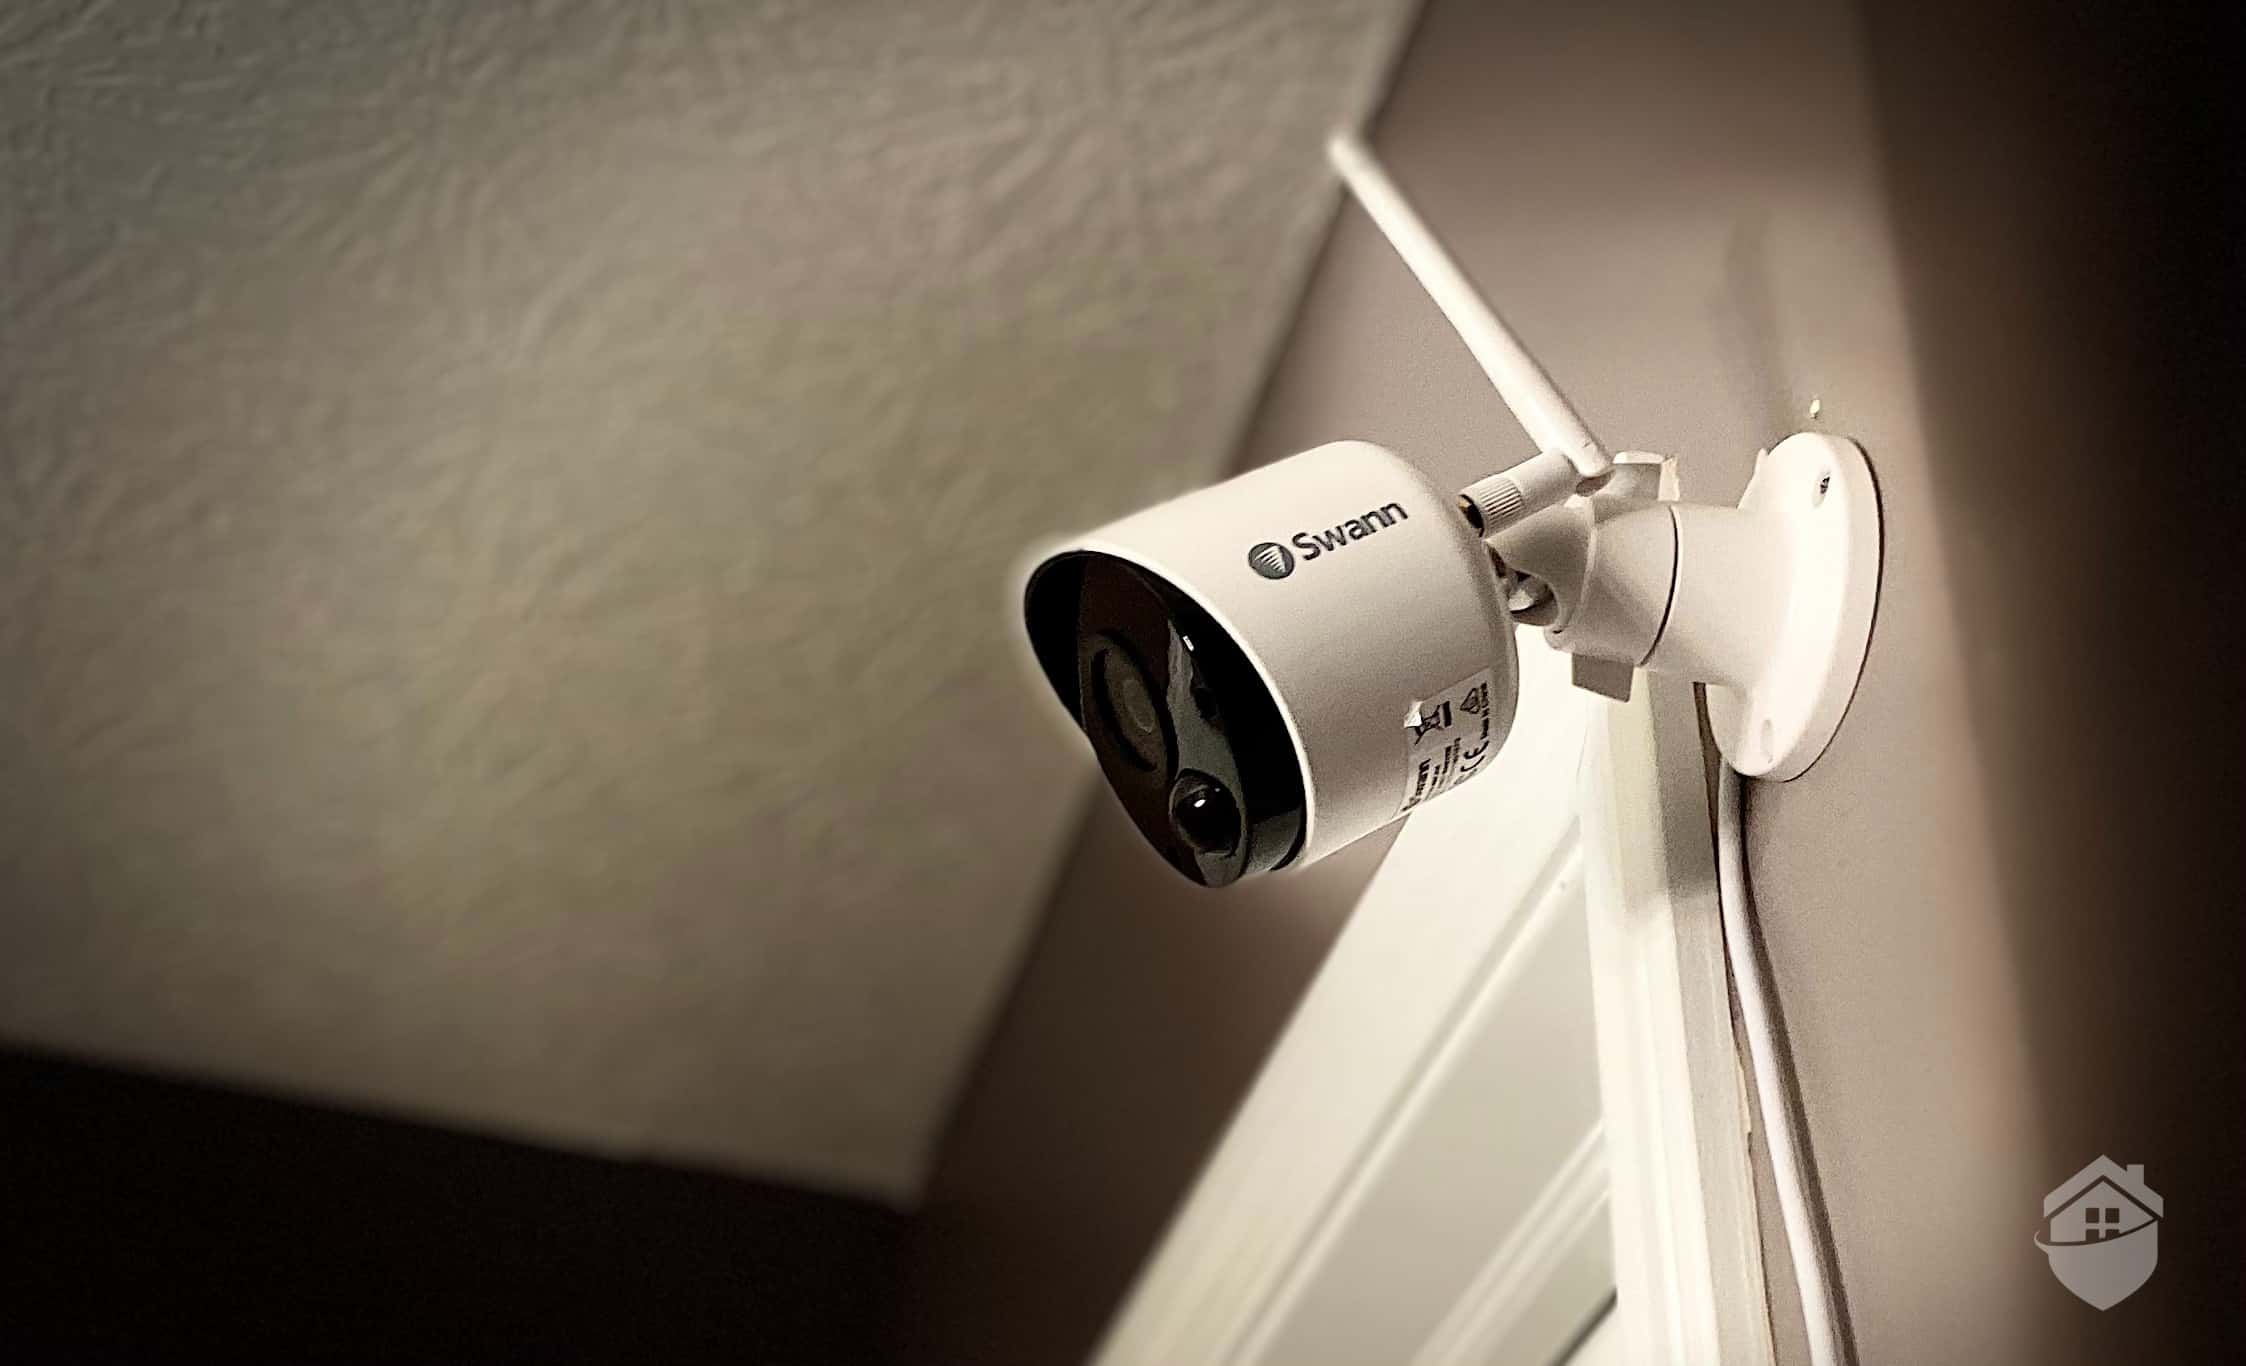 Swann Indoor Camera